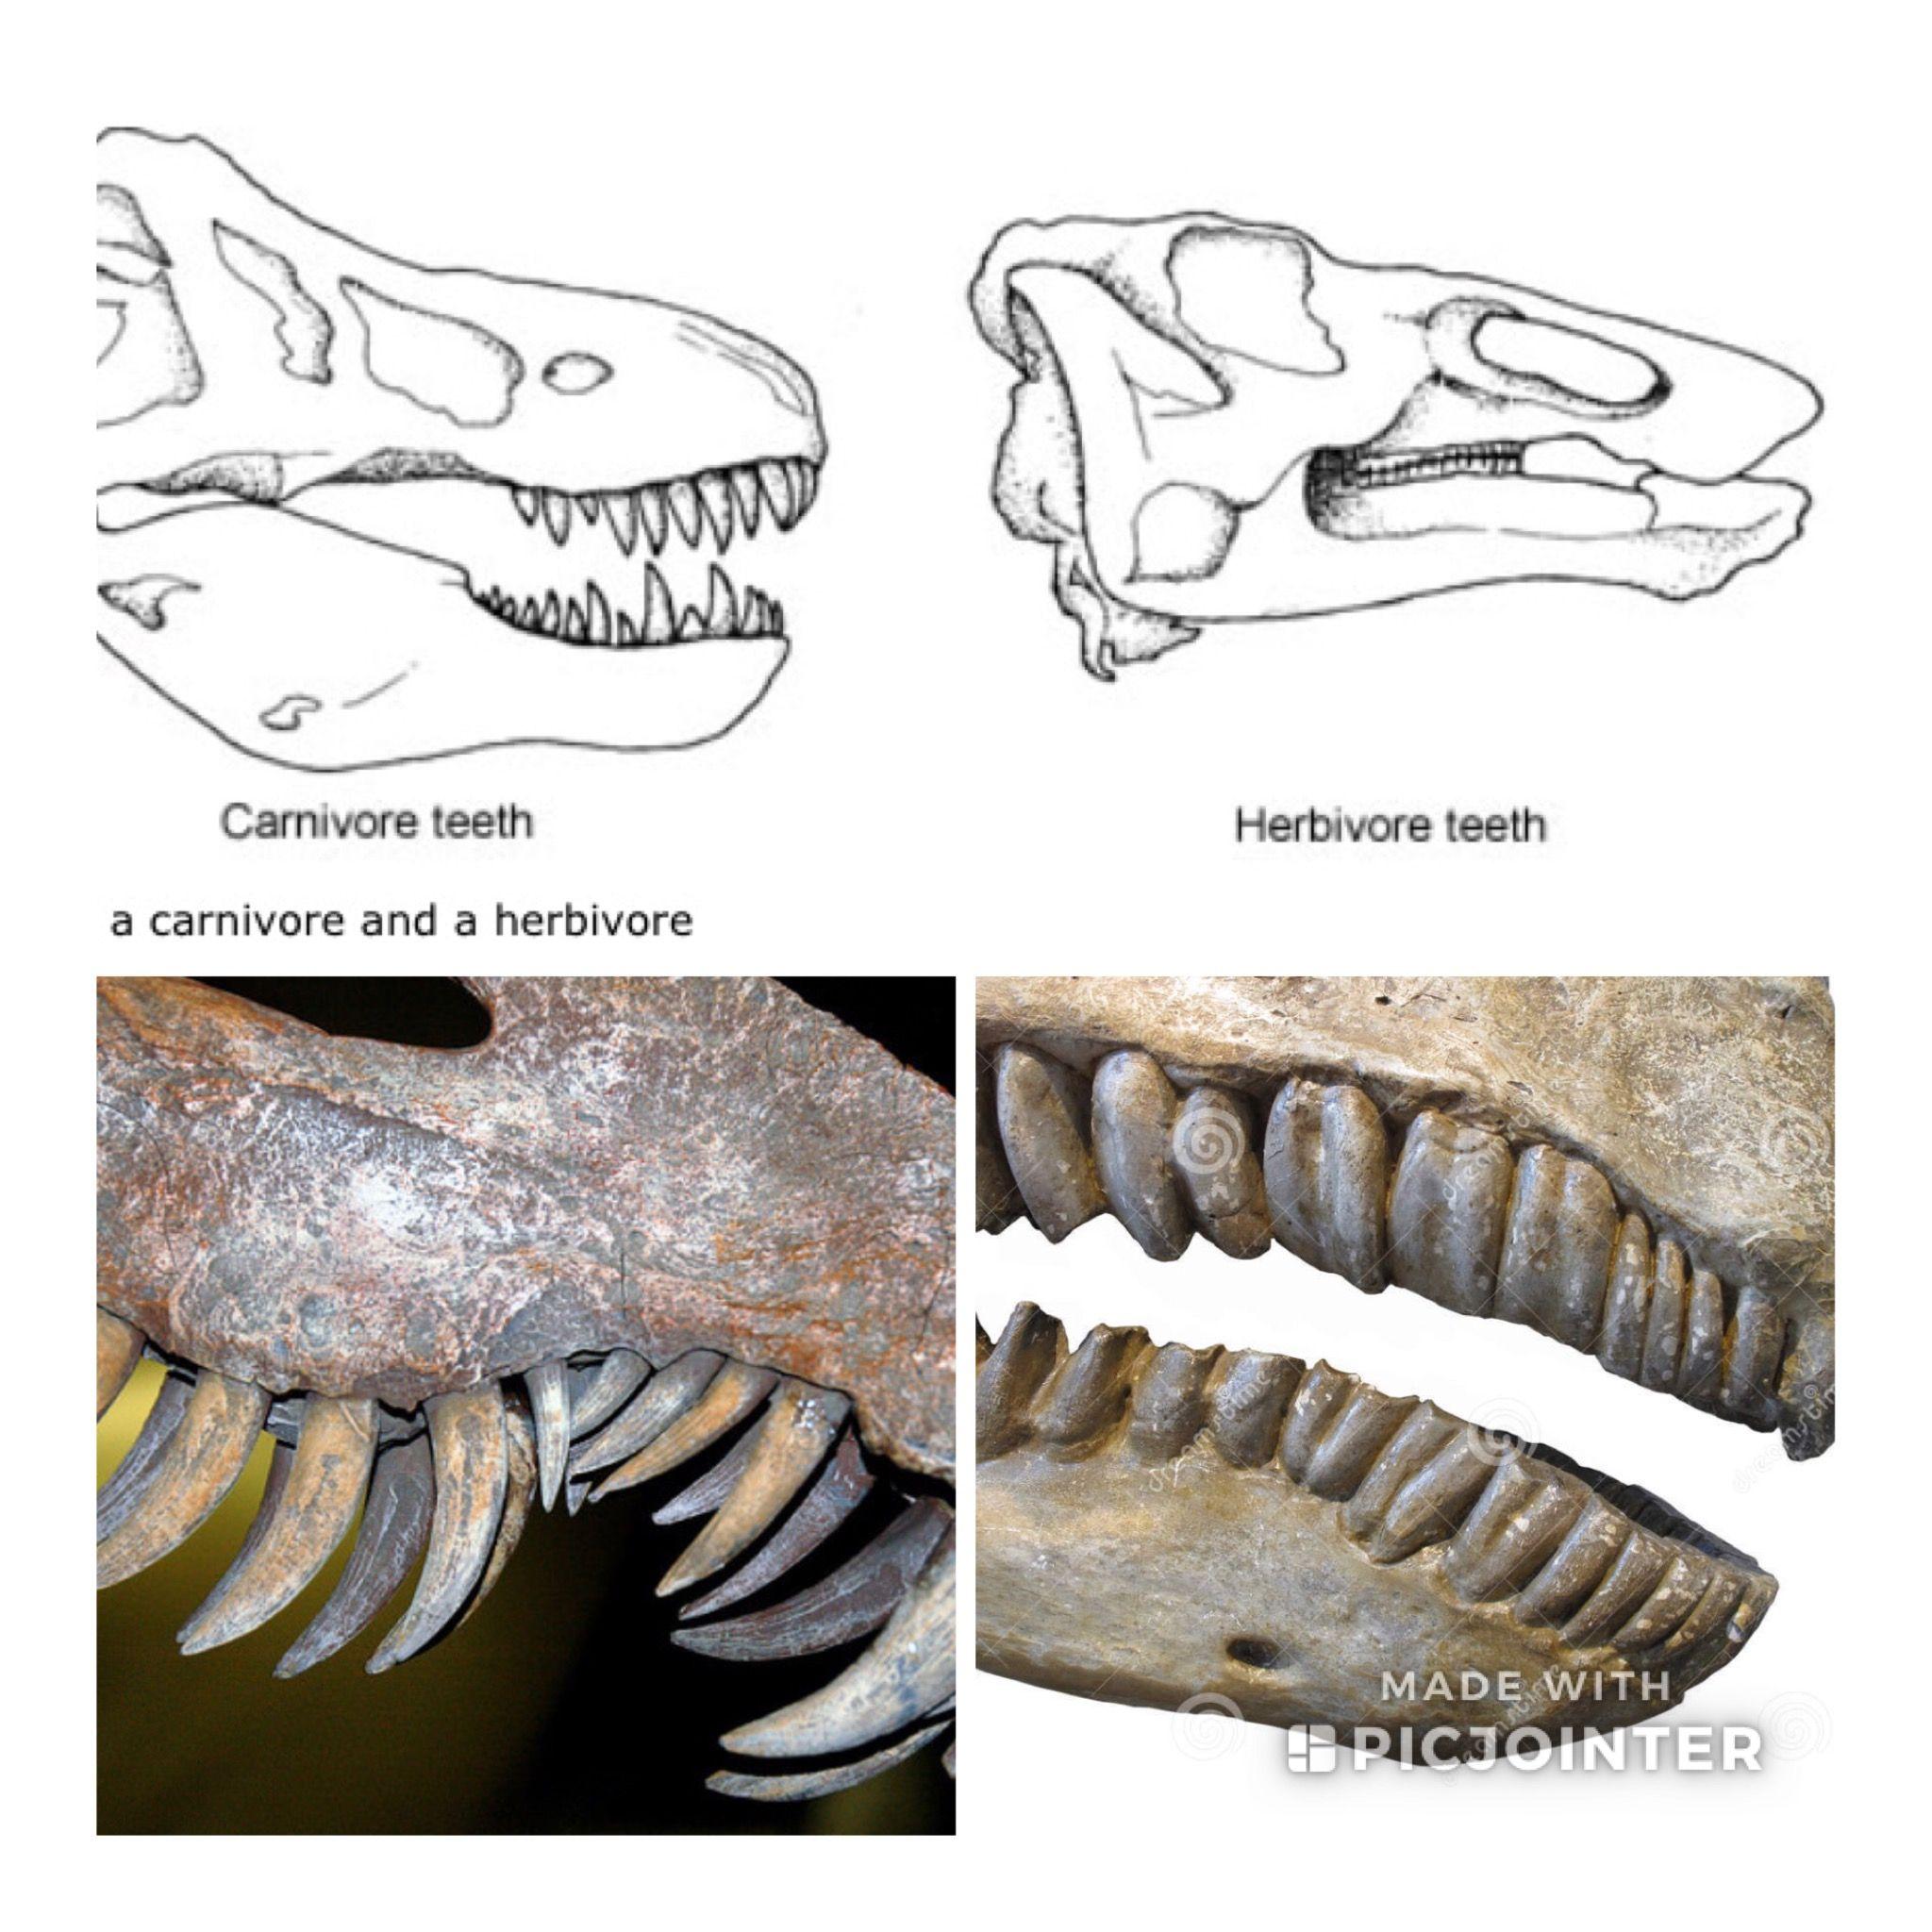 Dinosaur Teeth Comparison Meat Eating Vs Plant Eating